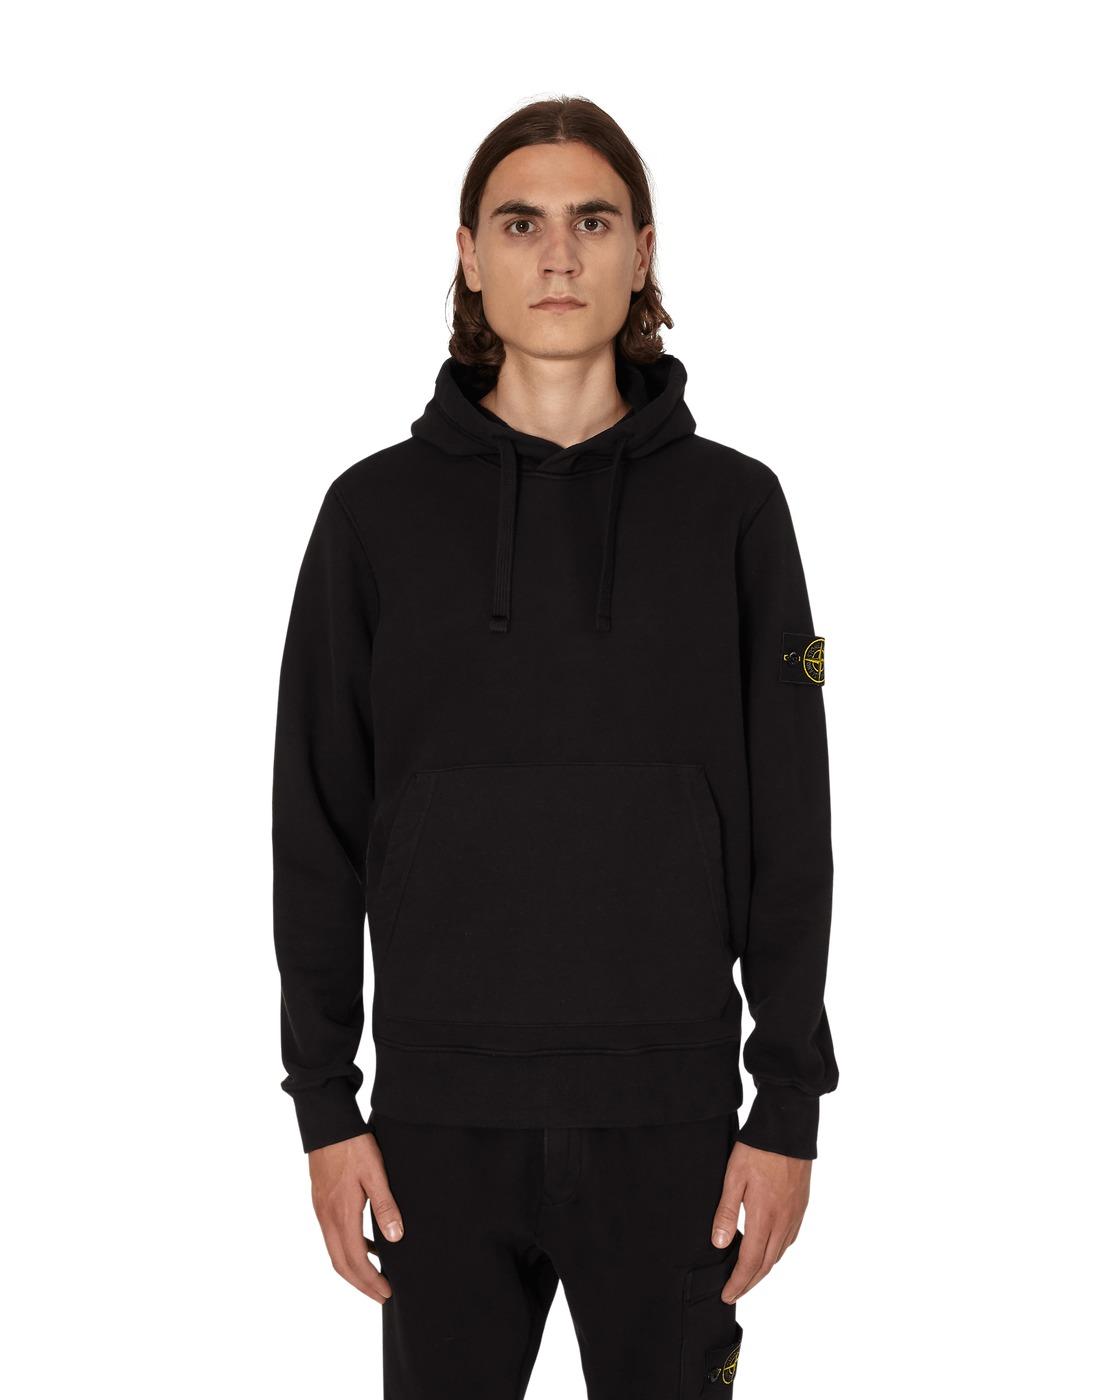 Photo: Stone Island Hooded Sweatshirt Black